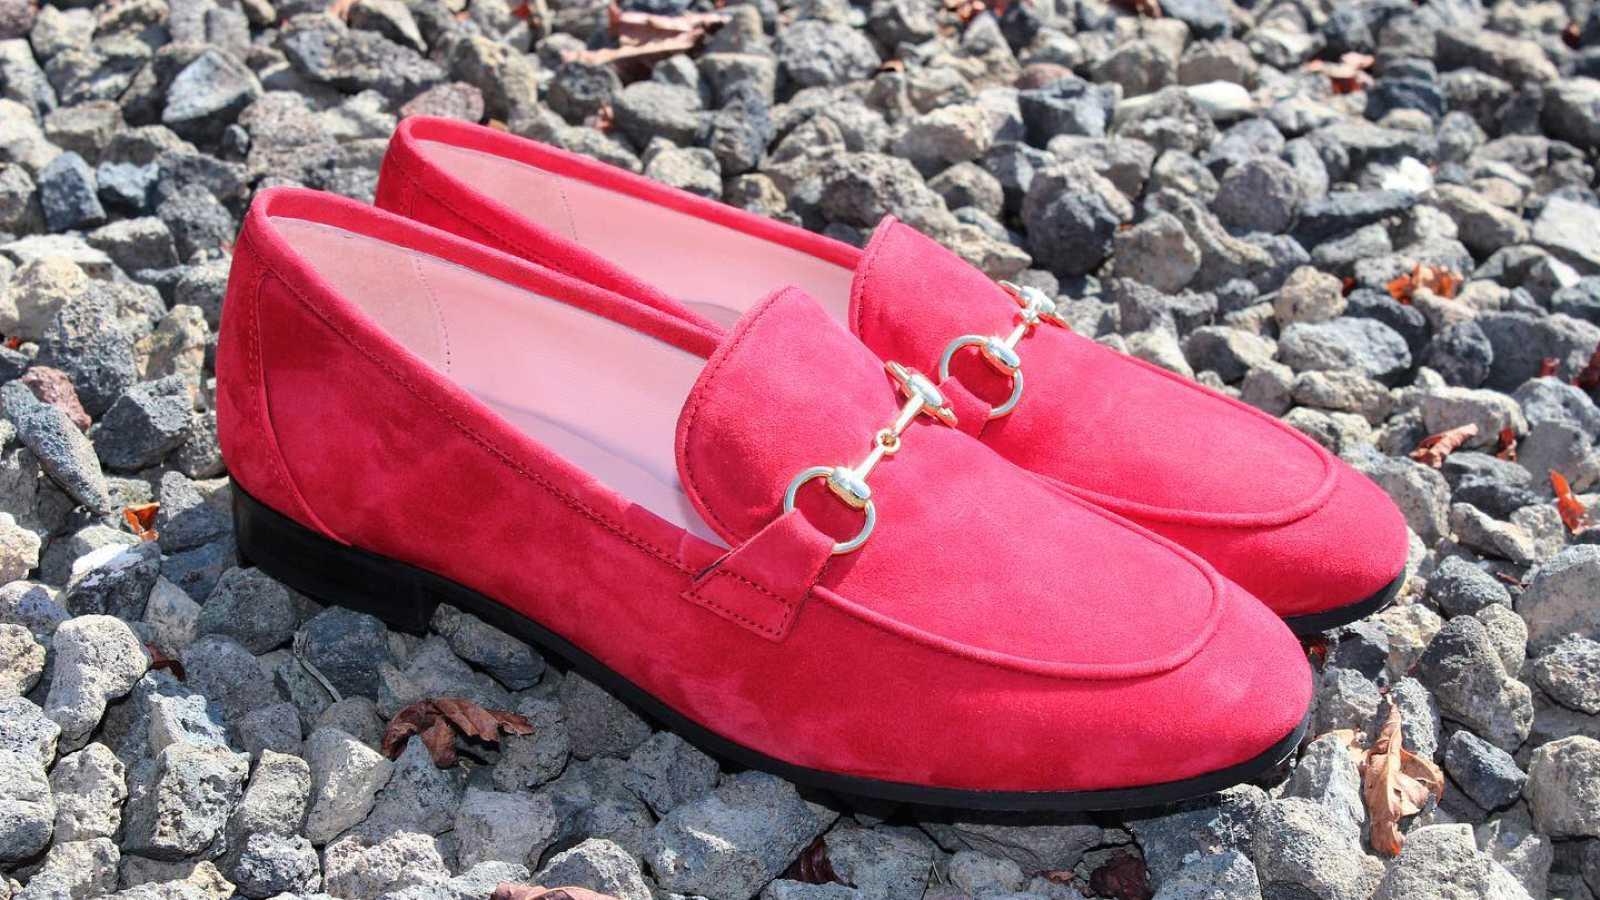 Marca España - Zapatos 'made in Spain' personalizables - 20/11/20 - escuchar ahora